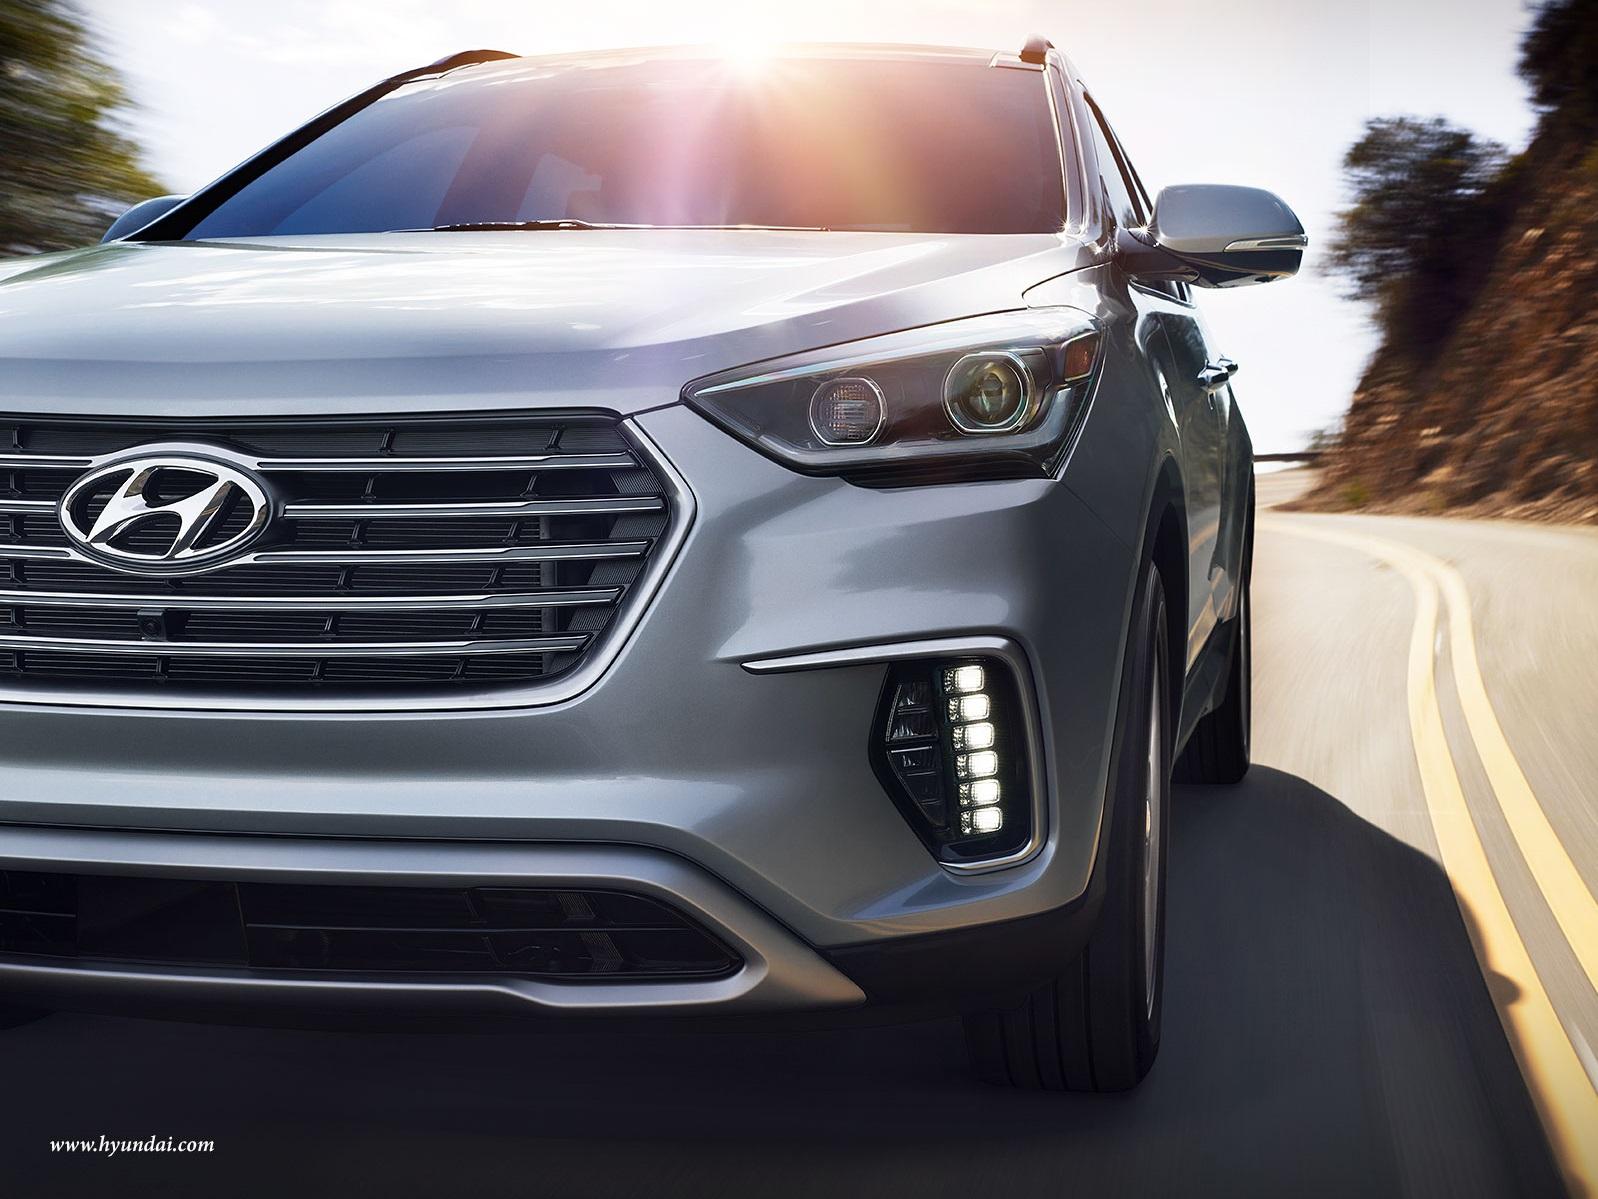 Southfield MI - 2018 Hyundai Santa Fe Sport's Overview